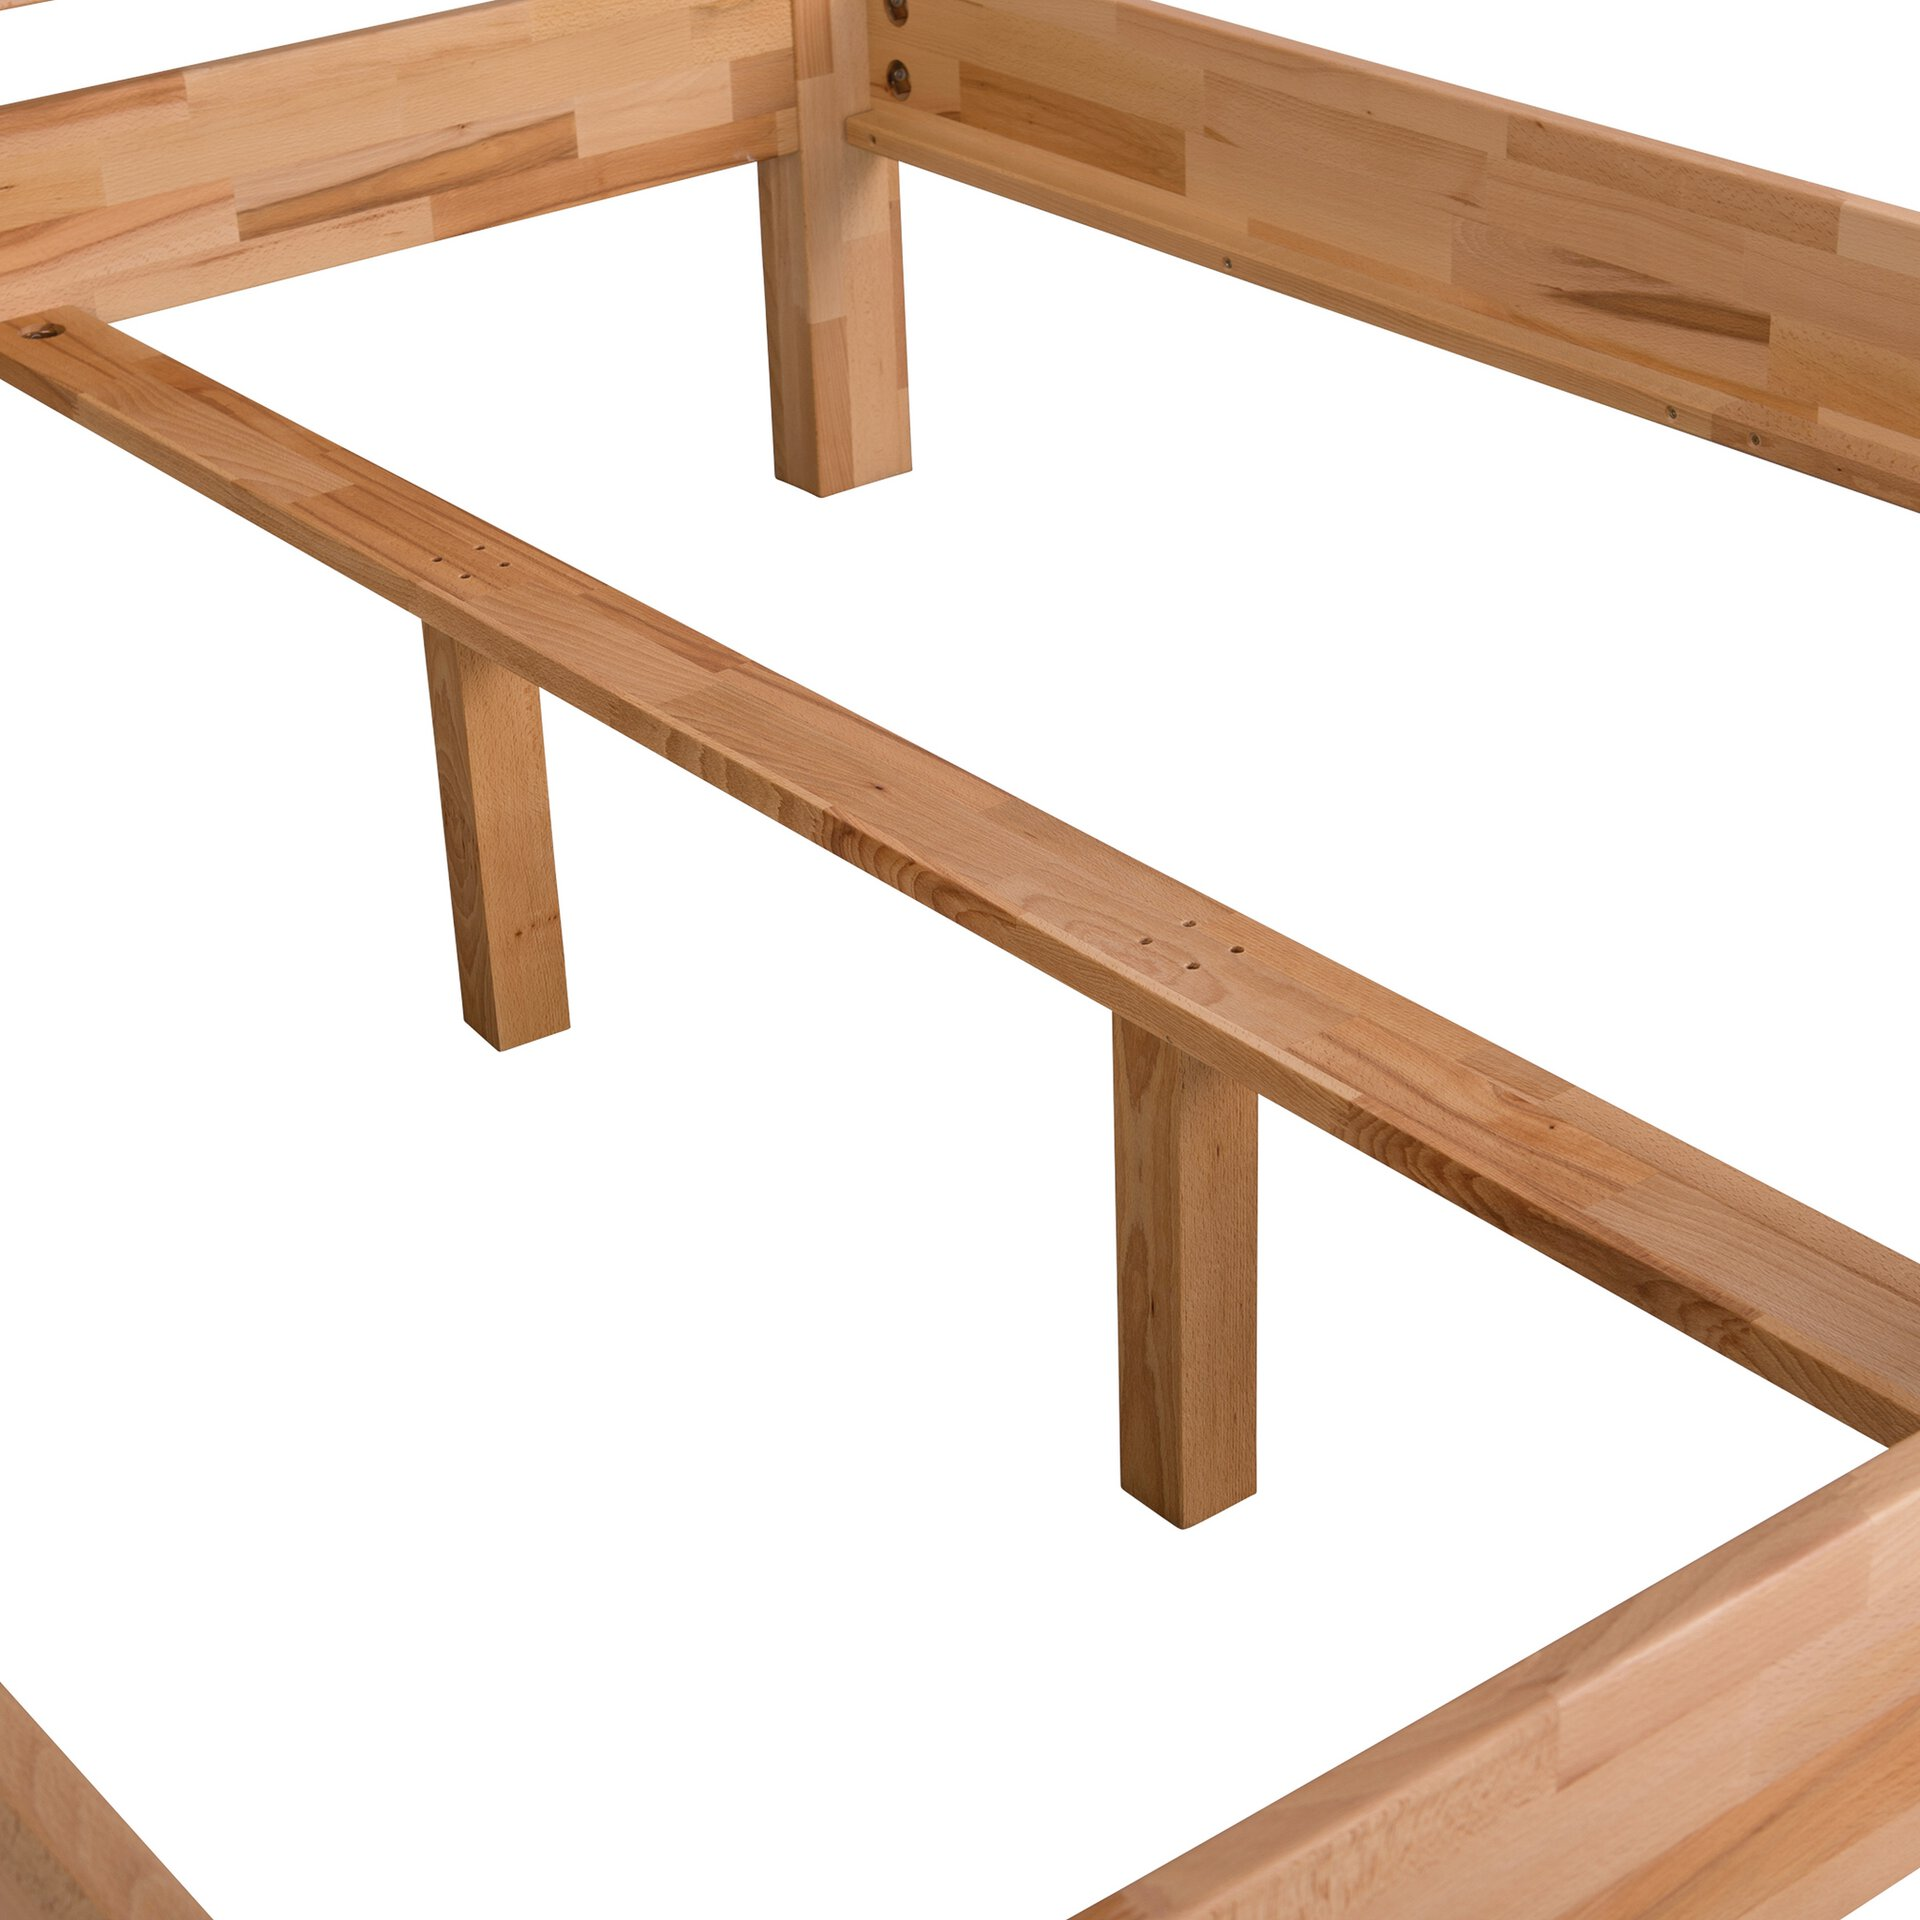 Bett BEETHOVEN Dreamoro Holz braun 180 x 99 x 200 cm